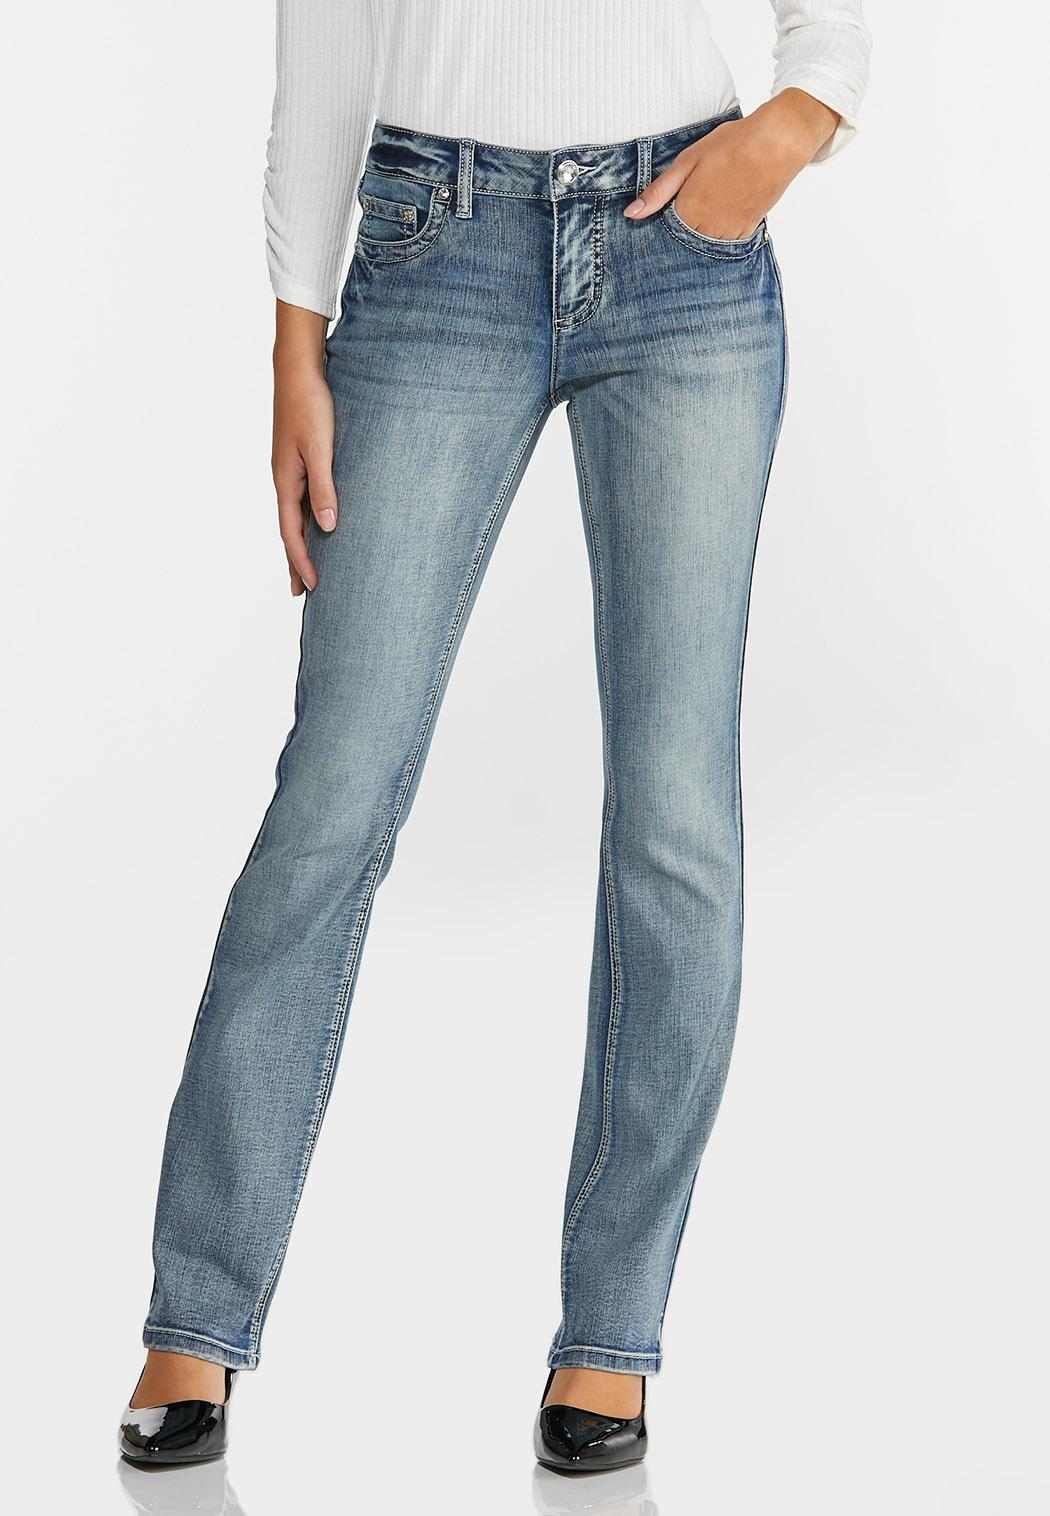 Petite Embellished Fleur De Lis Jeans (Item #44329553)